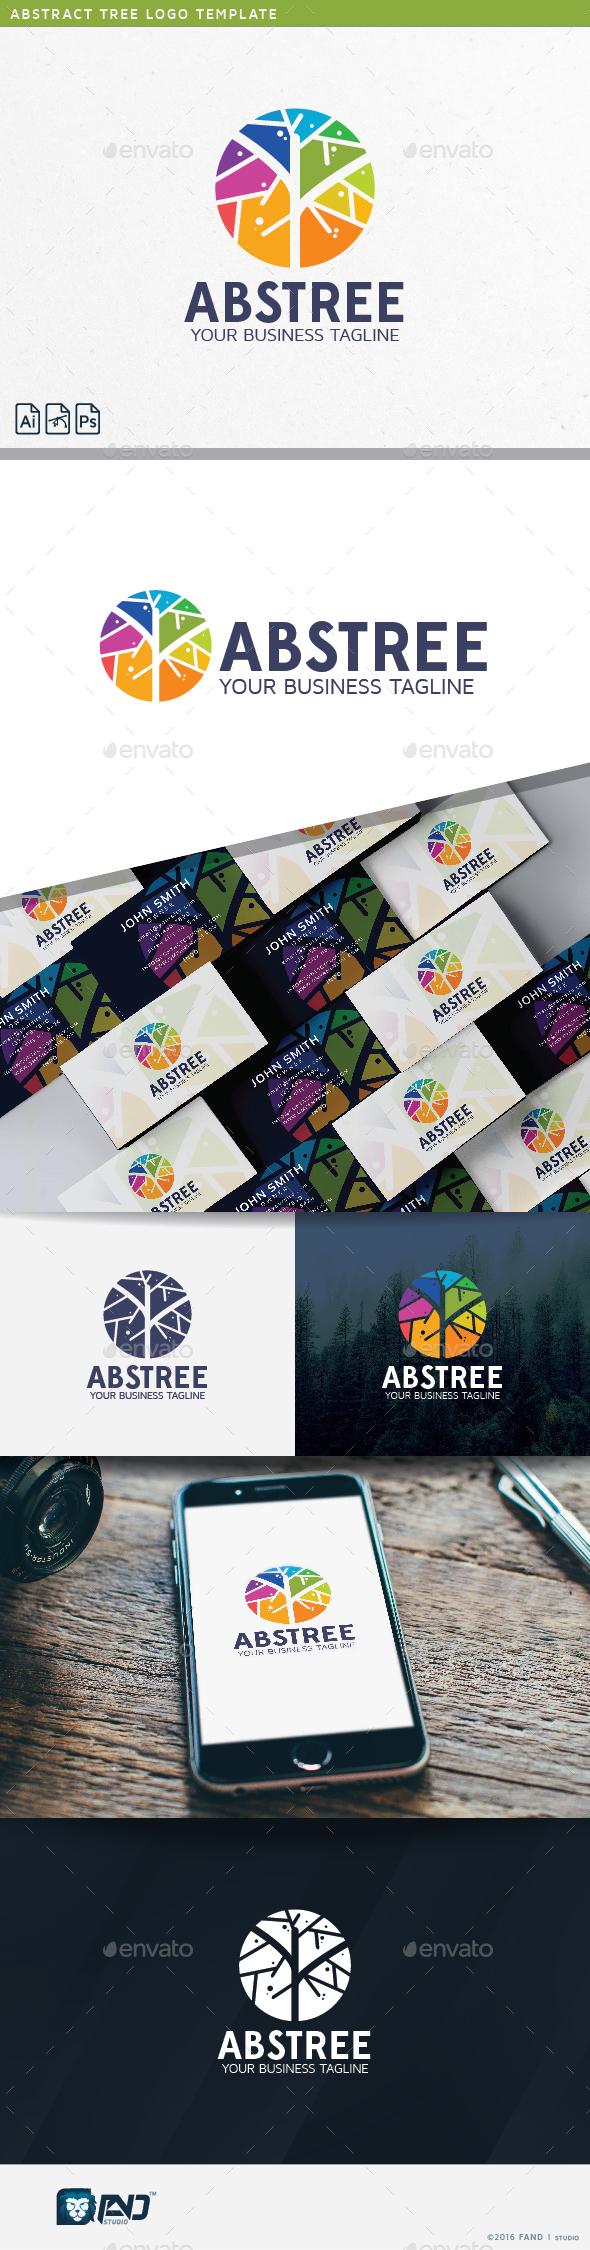 Abstract Tree Logo - Abstract Logo Templates